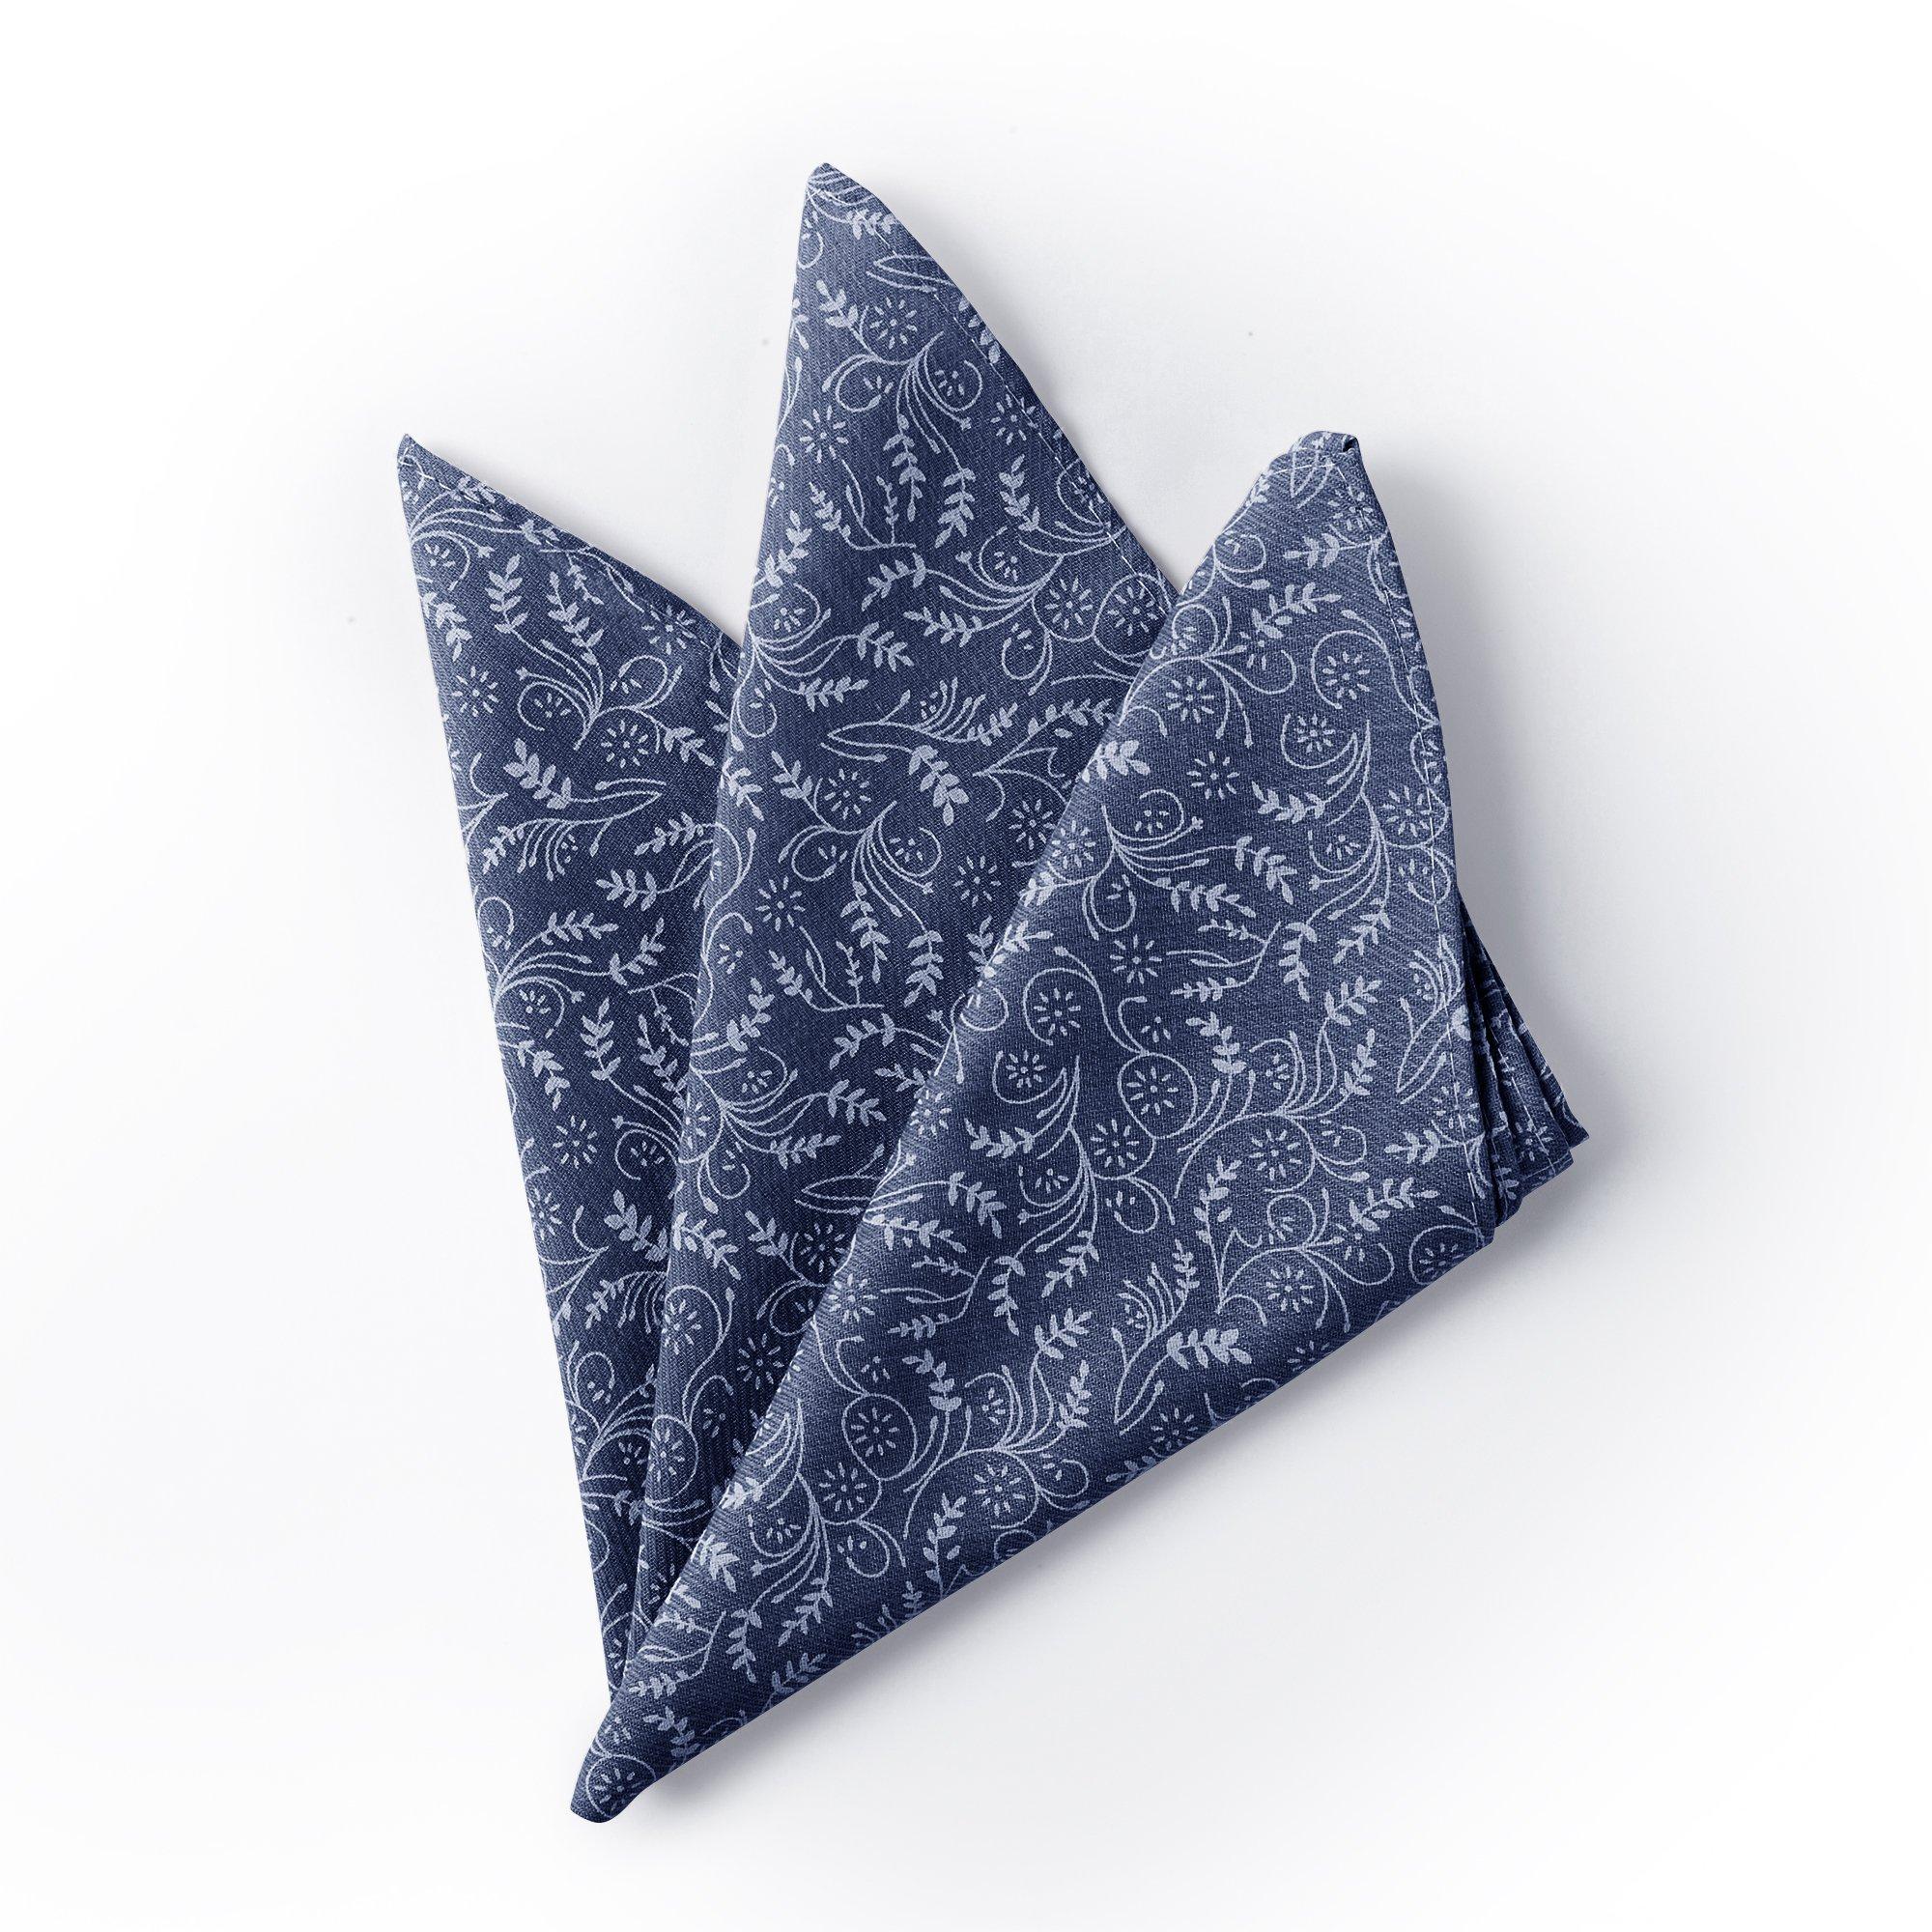 Jacob Alexander Men's Floral Pocket Square Handkerchief - Slate Blue